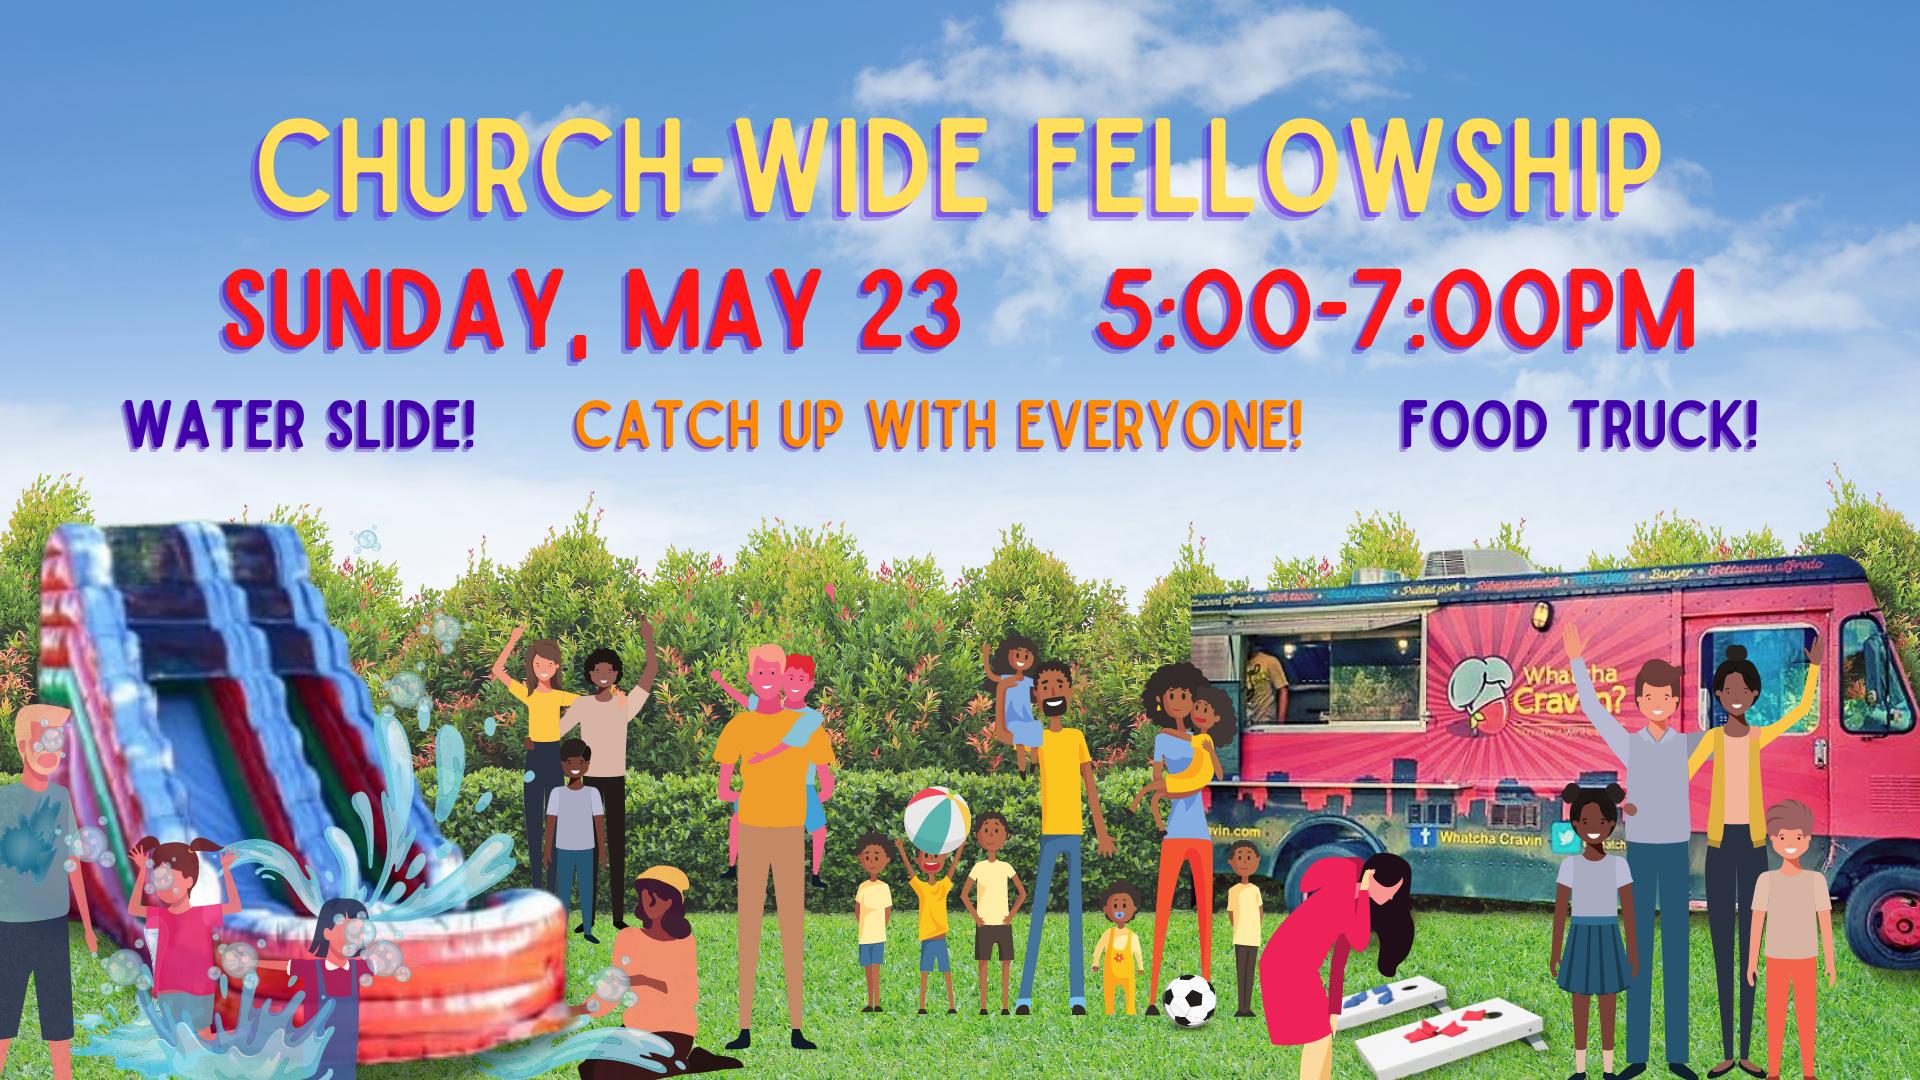 Church-wide Fellowship (1)